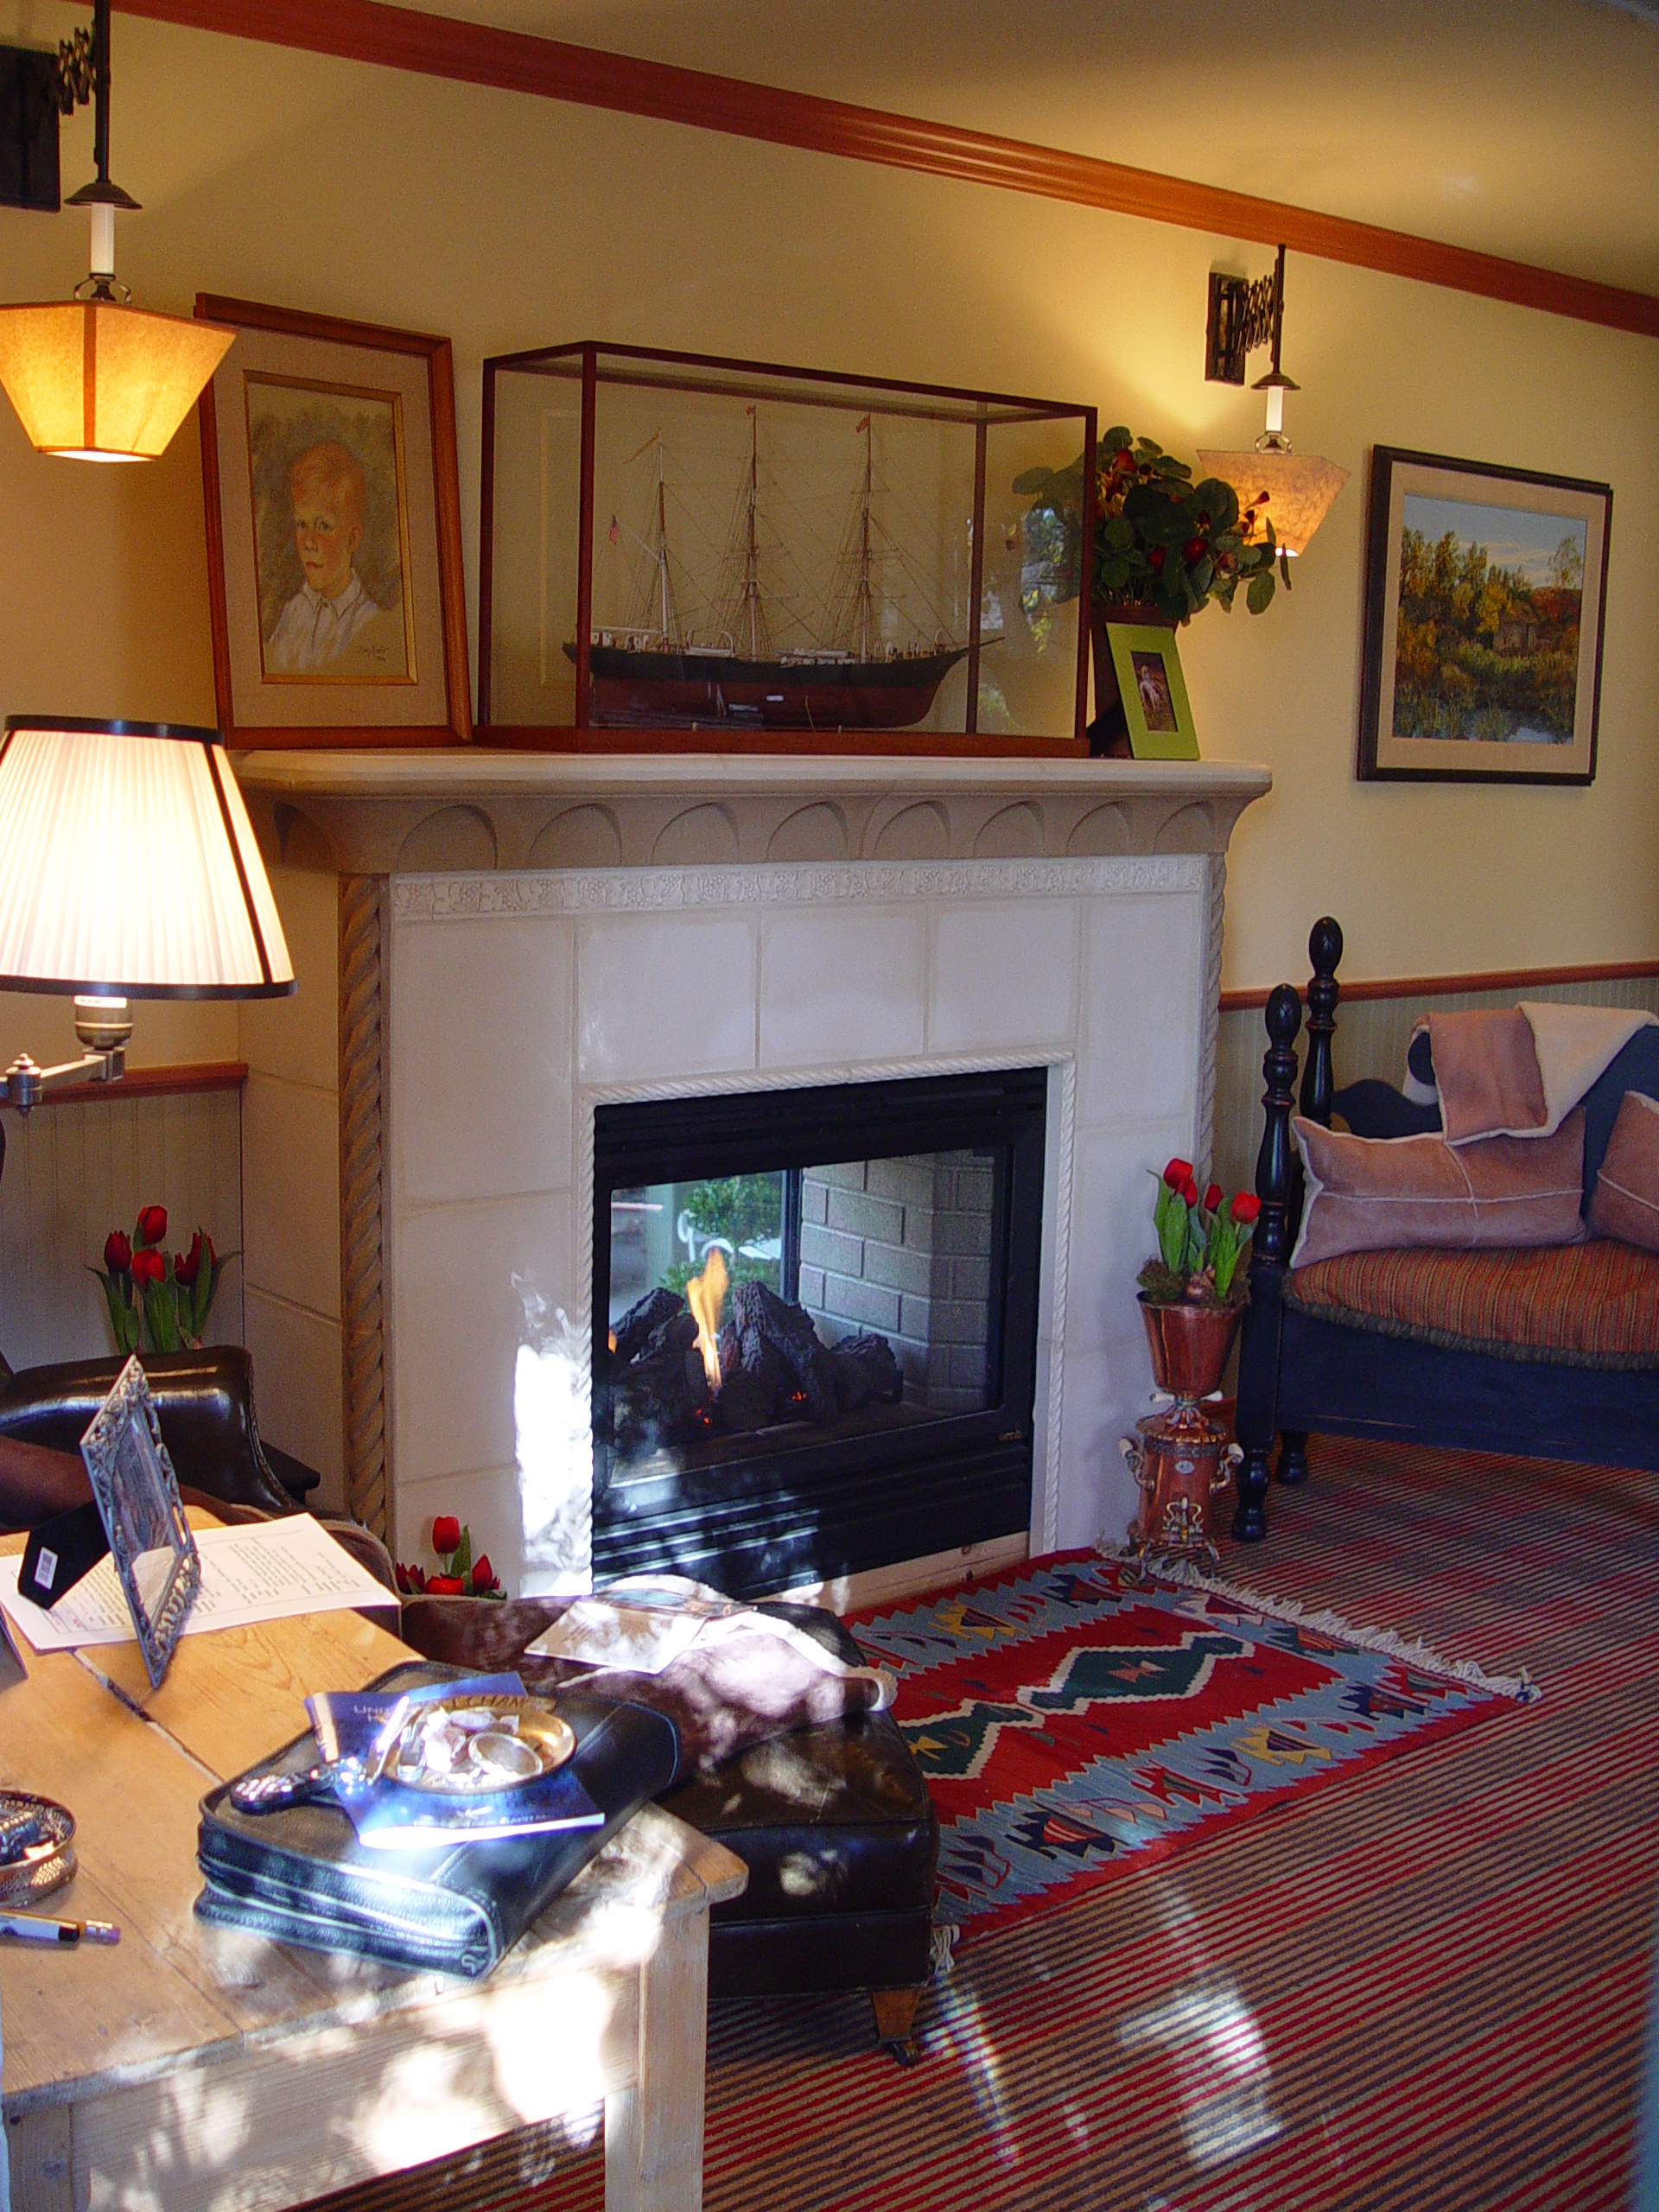 Indoor outdoor fireplace flickr photo sharing for Back to back indoor outdoor fireplace